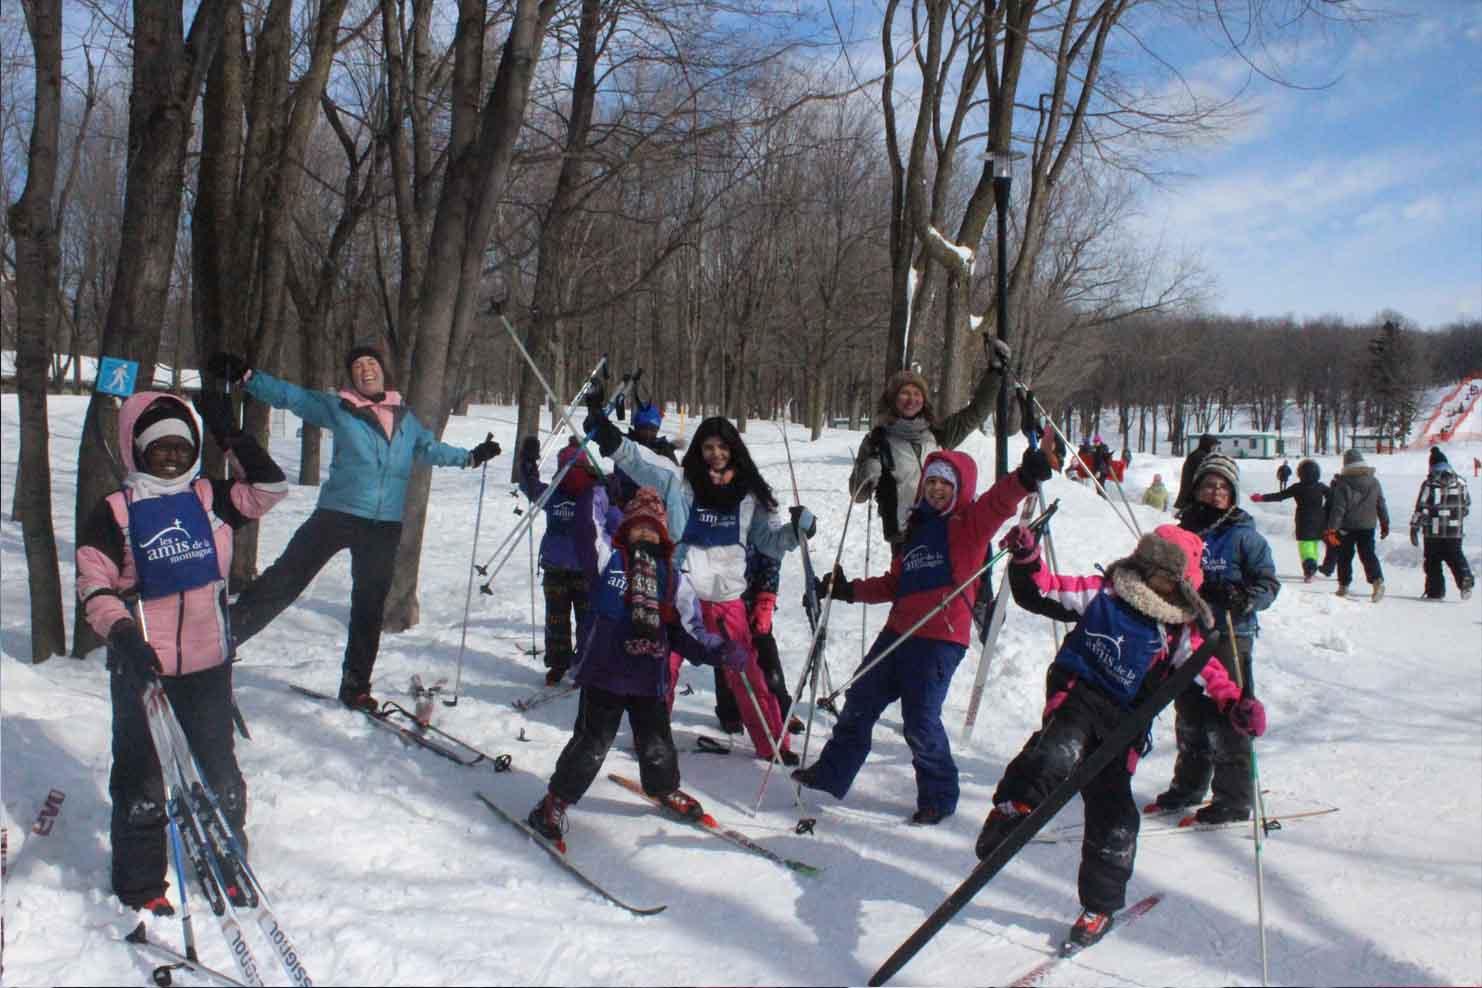 Youth Cross-Country Ski Club